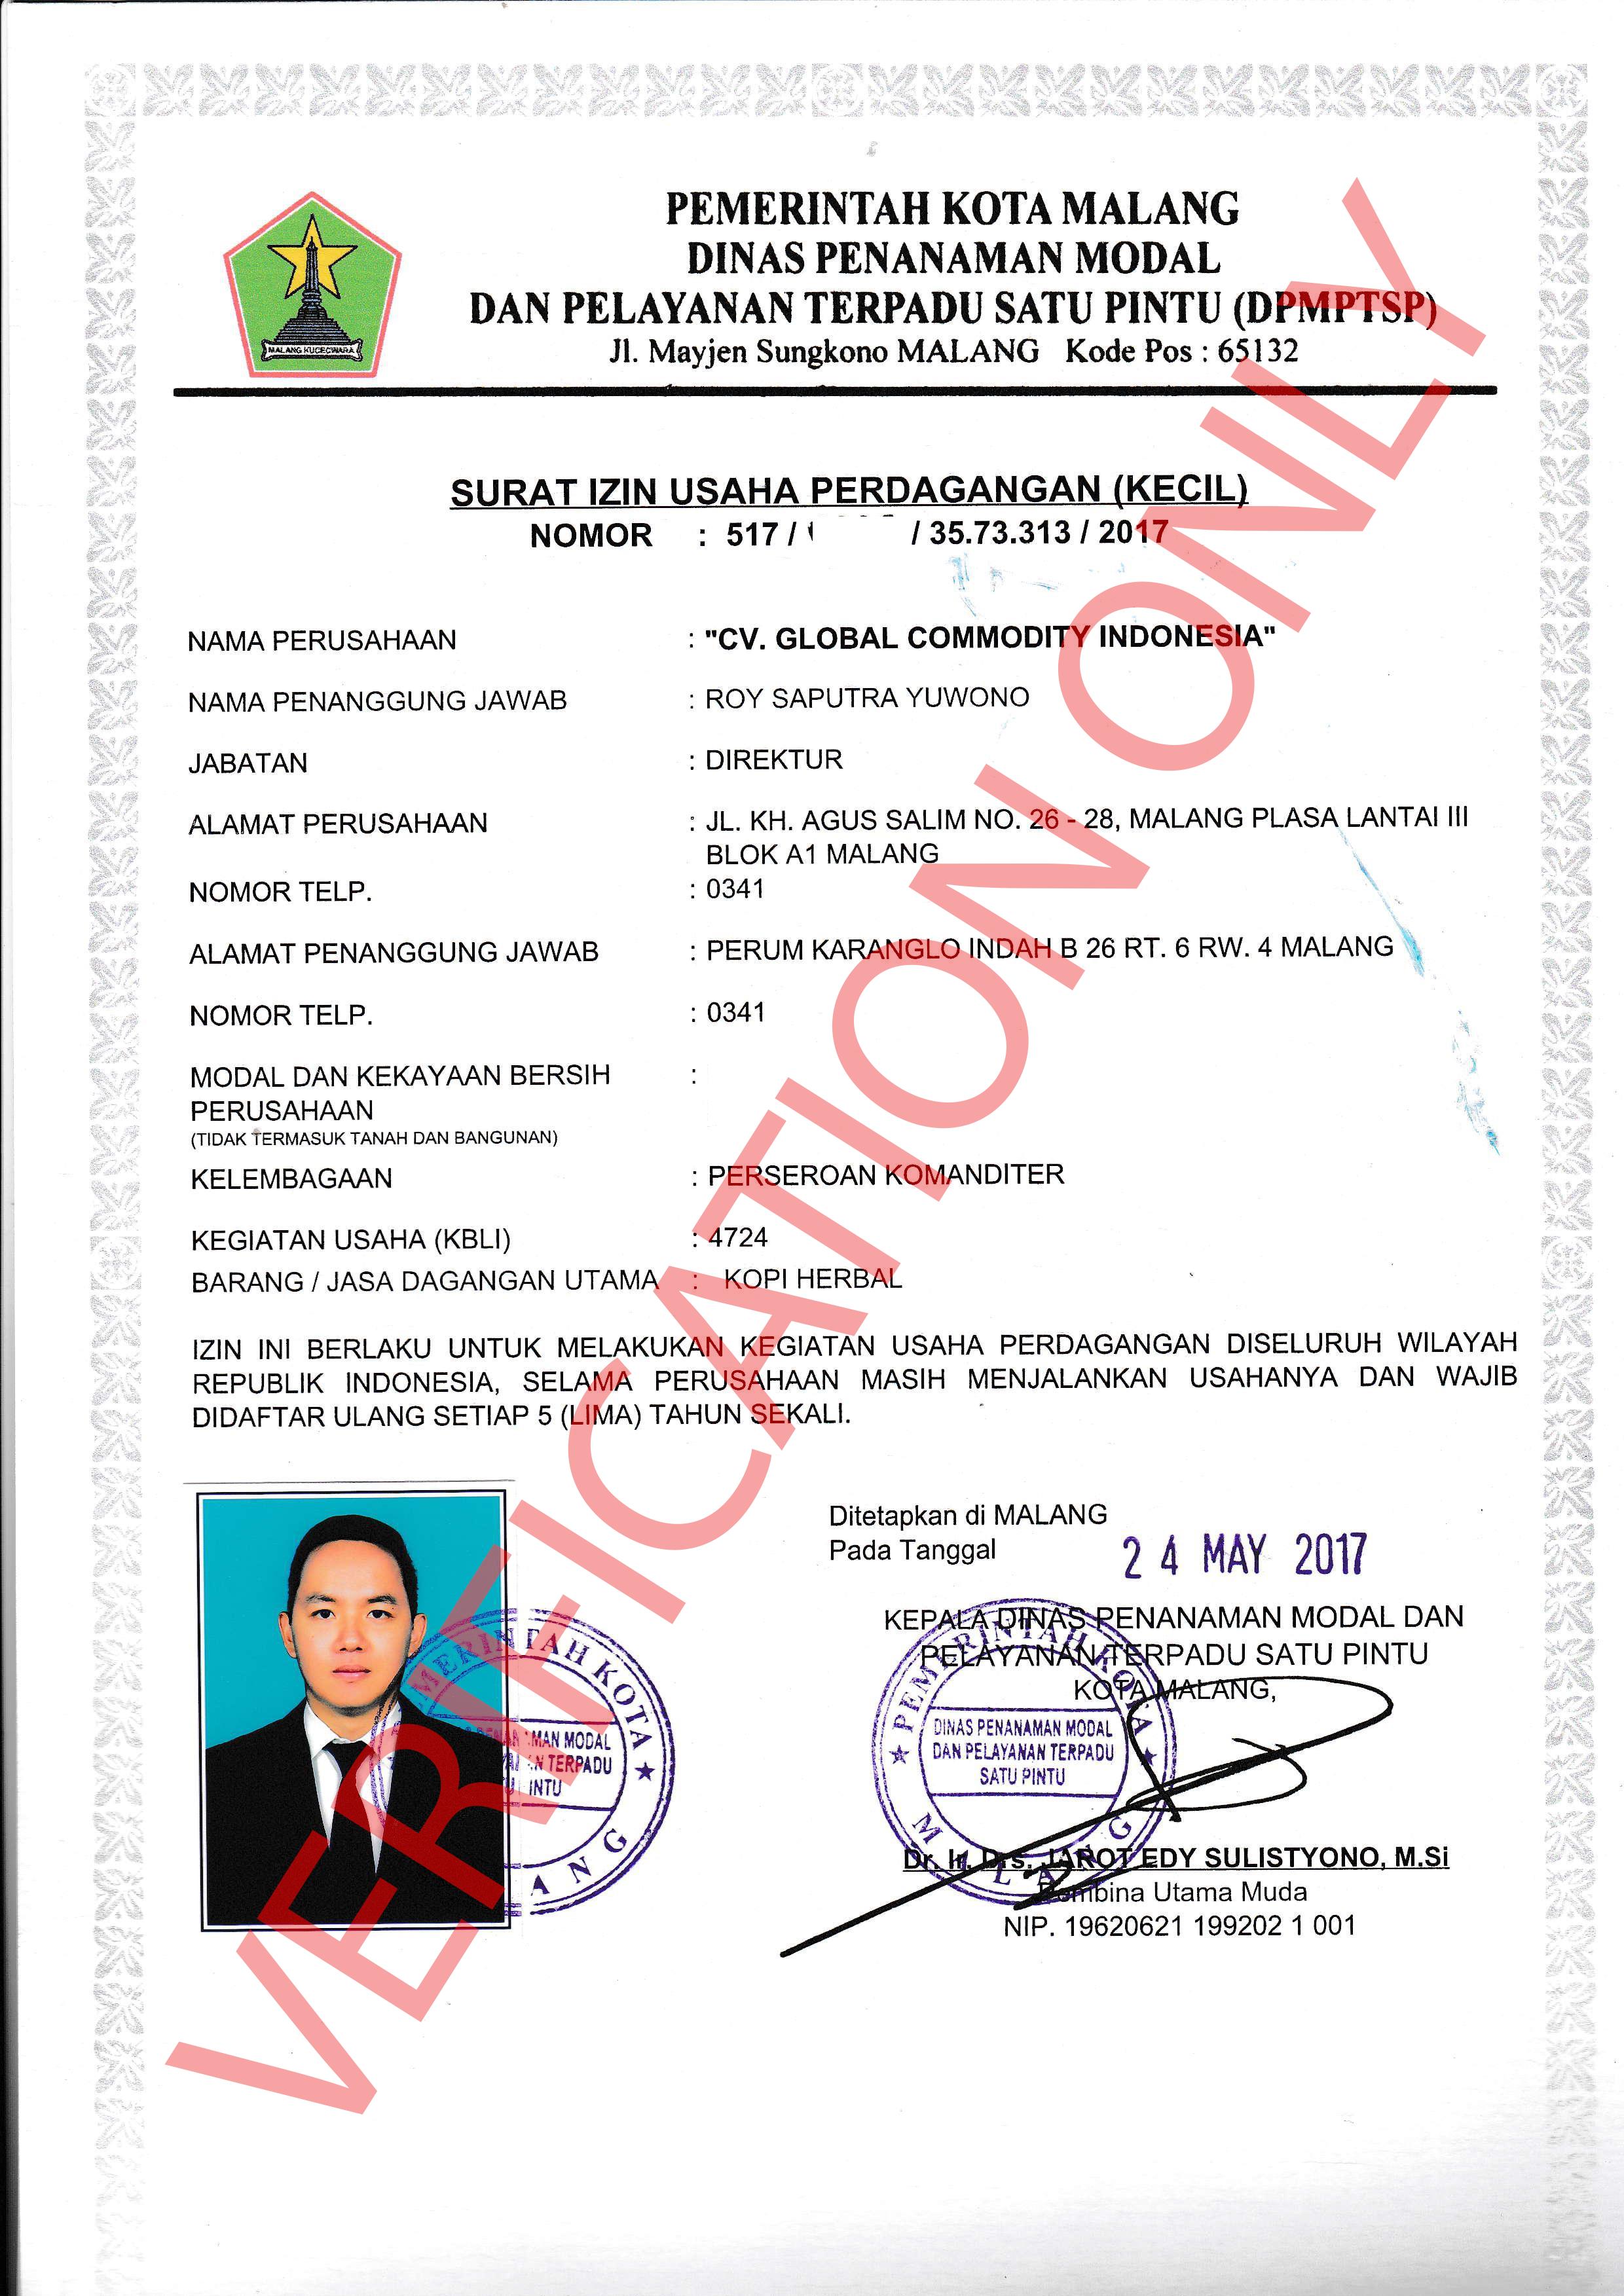 SIUPK (Surat Izin Usaha Perdagangan Kecil) - Shelton Indonesia Group - Food & Drinks & Hospitality Company